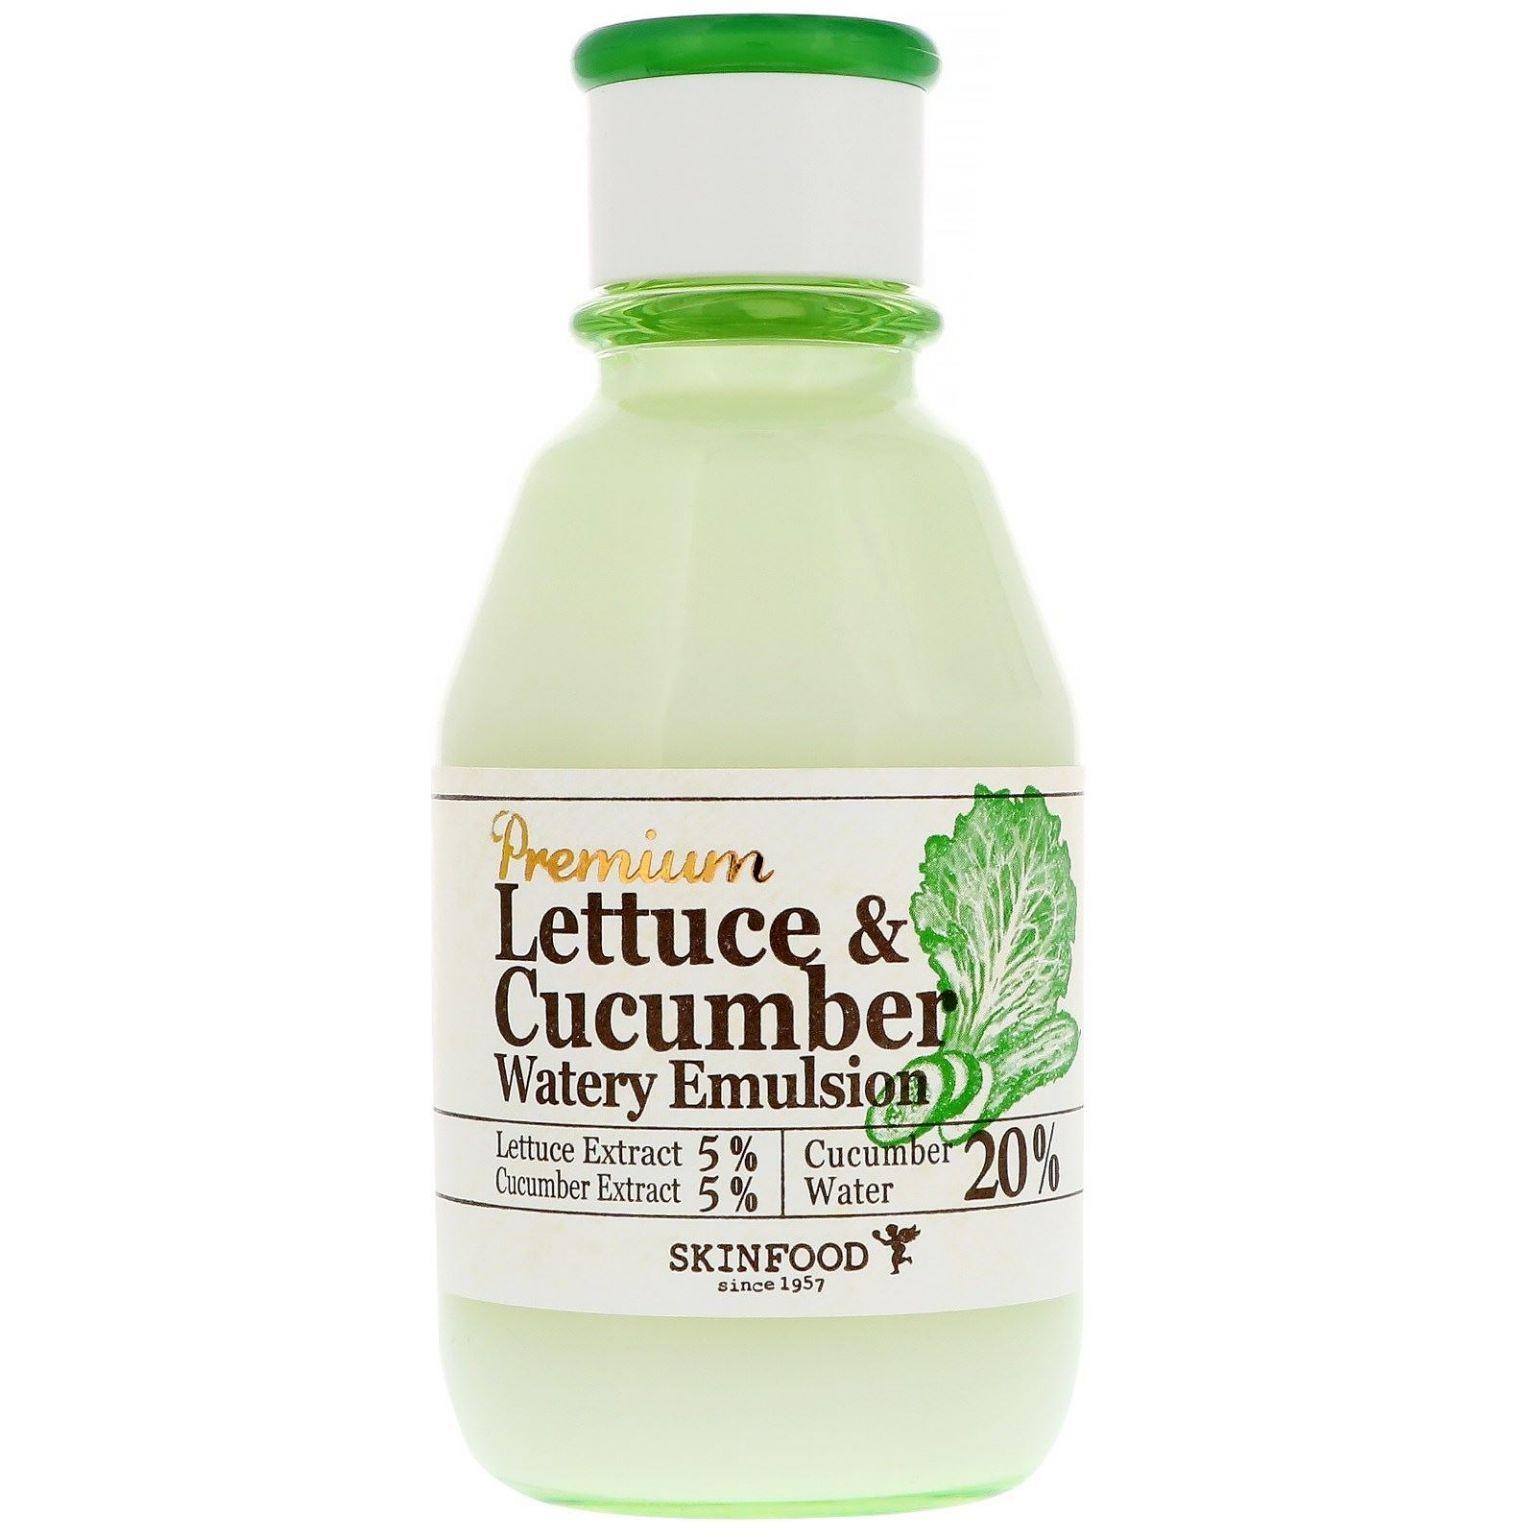 Lettuce & Cucumber Watery Emulsion